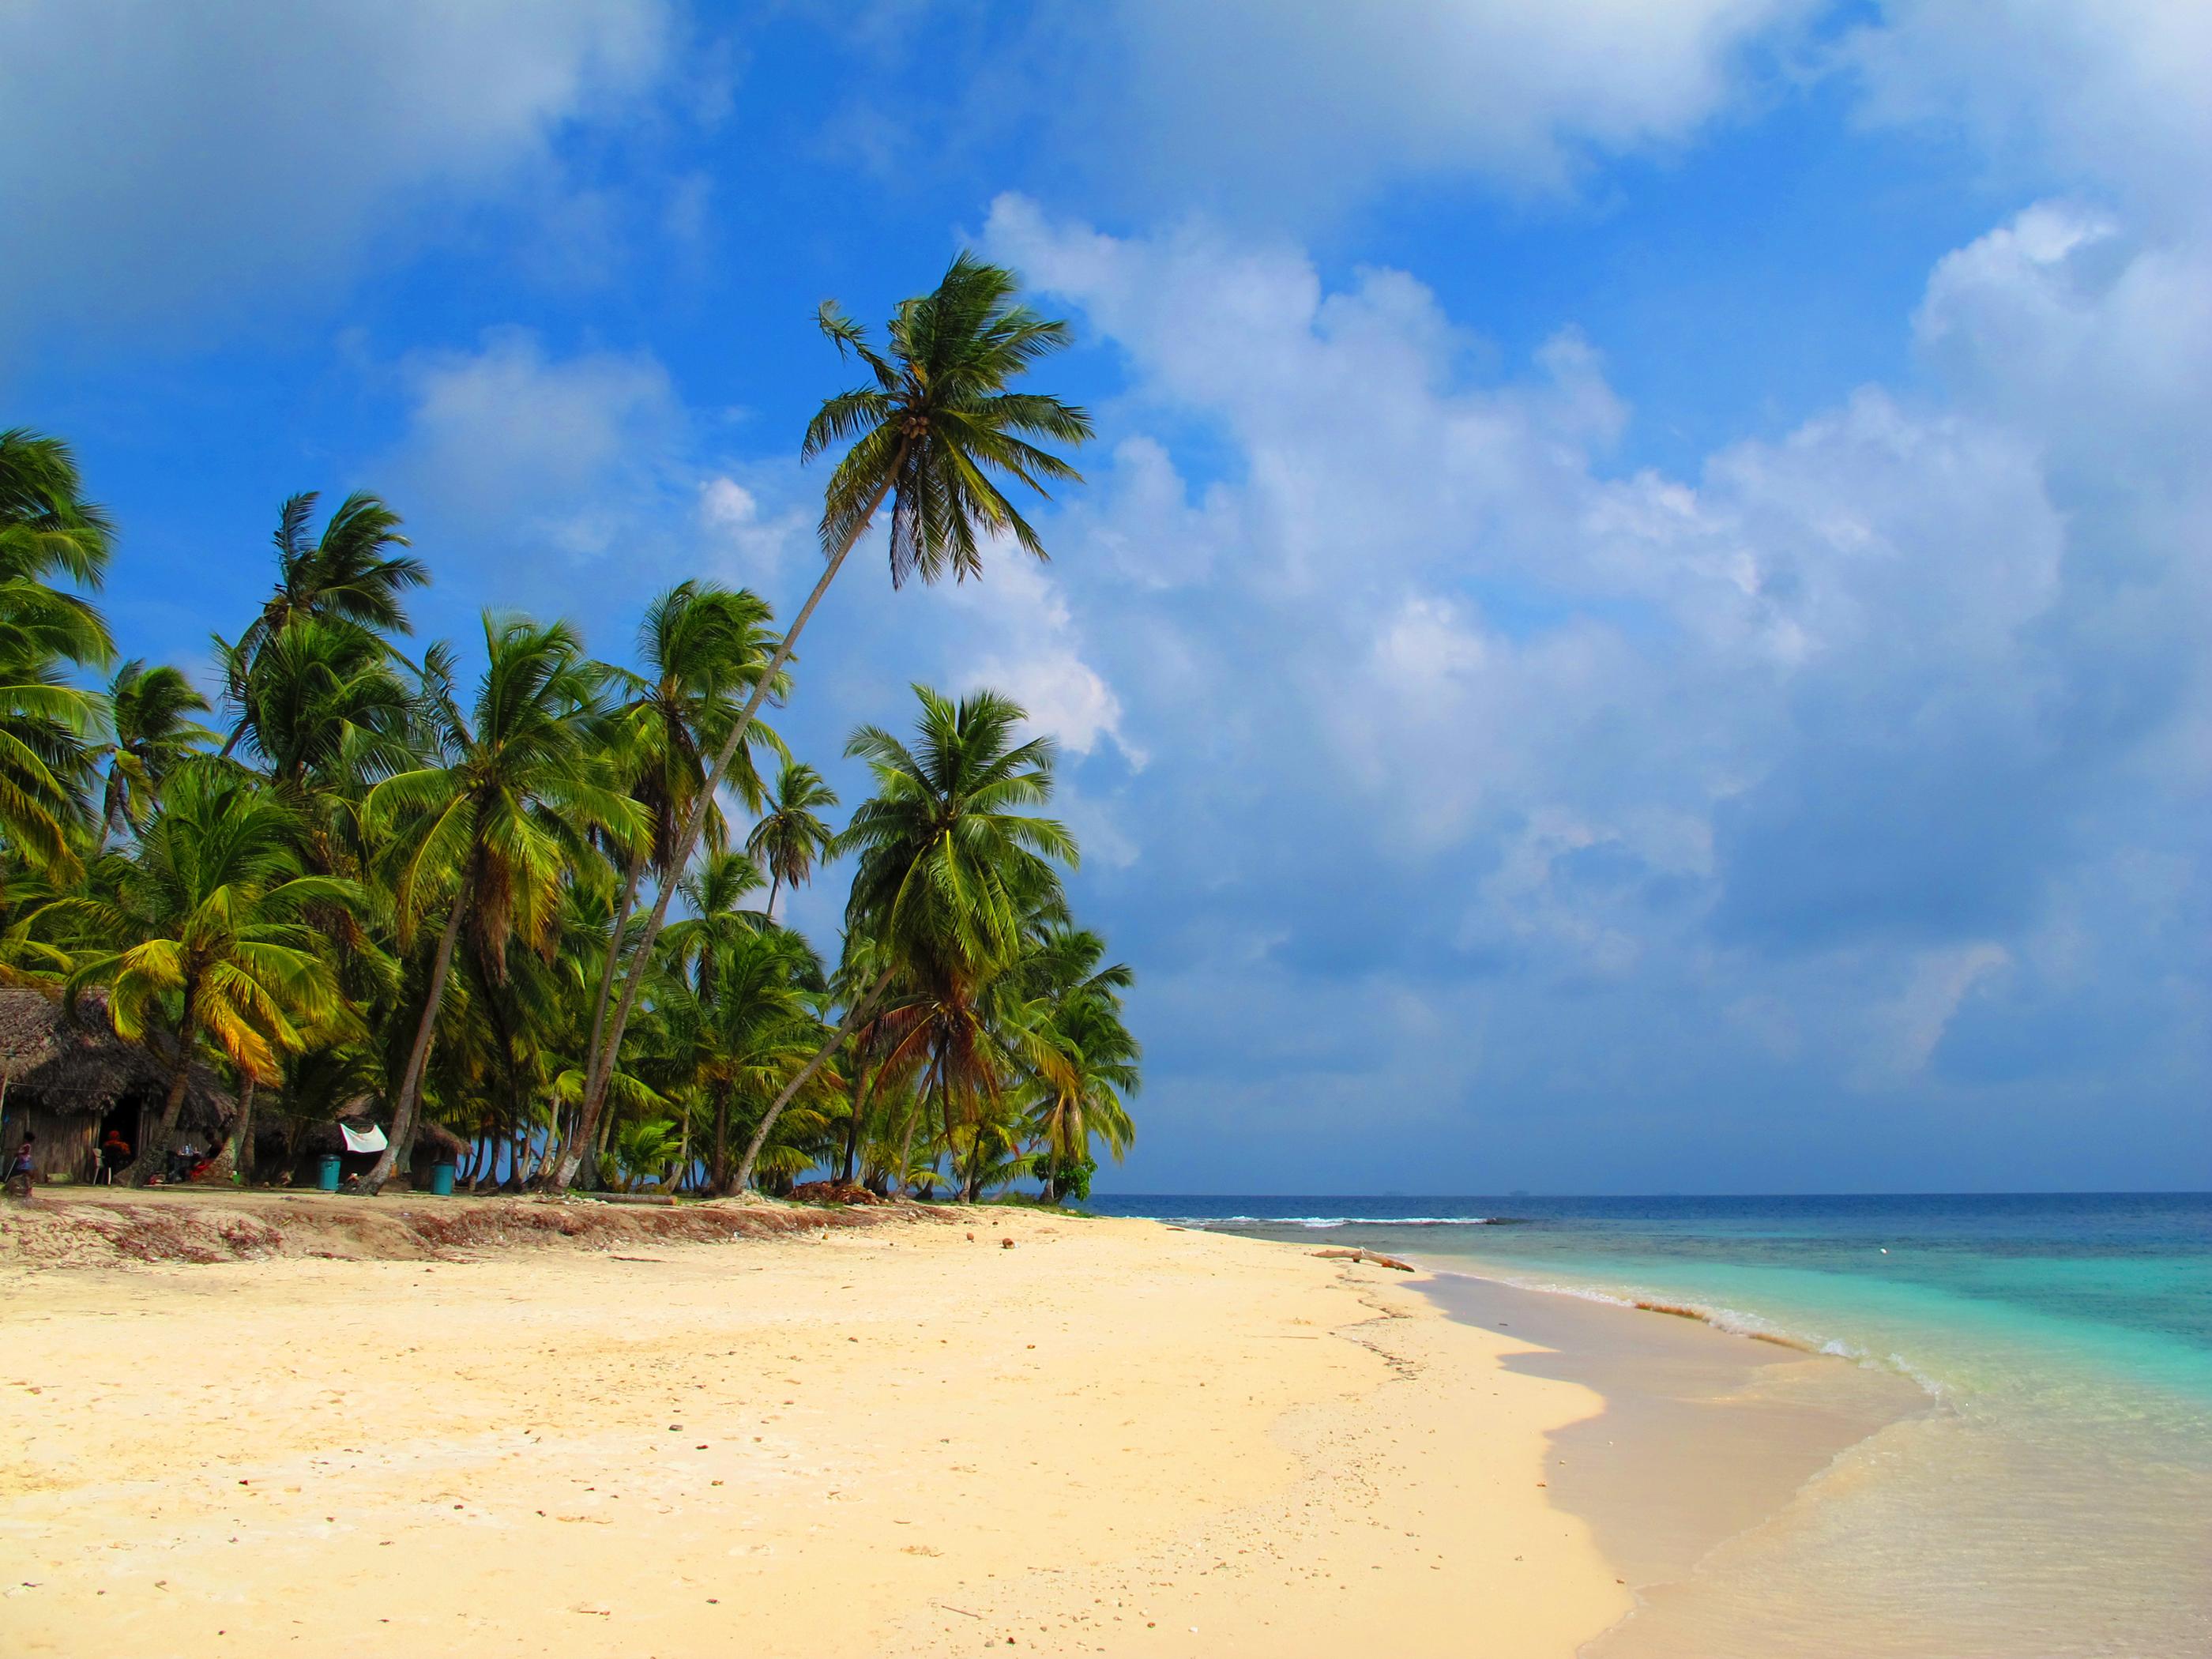 Playa Blanca Panama Villa For Sale